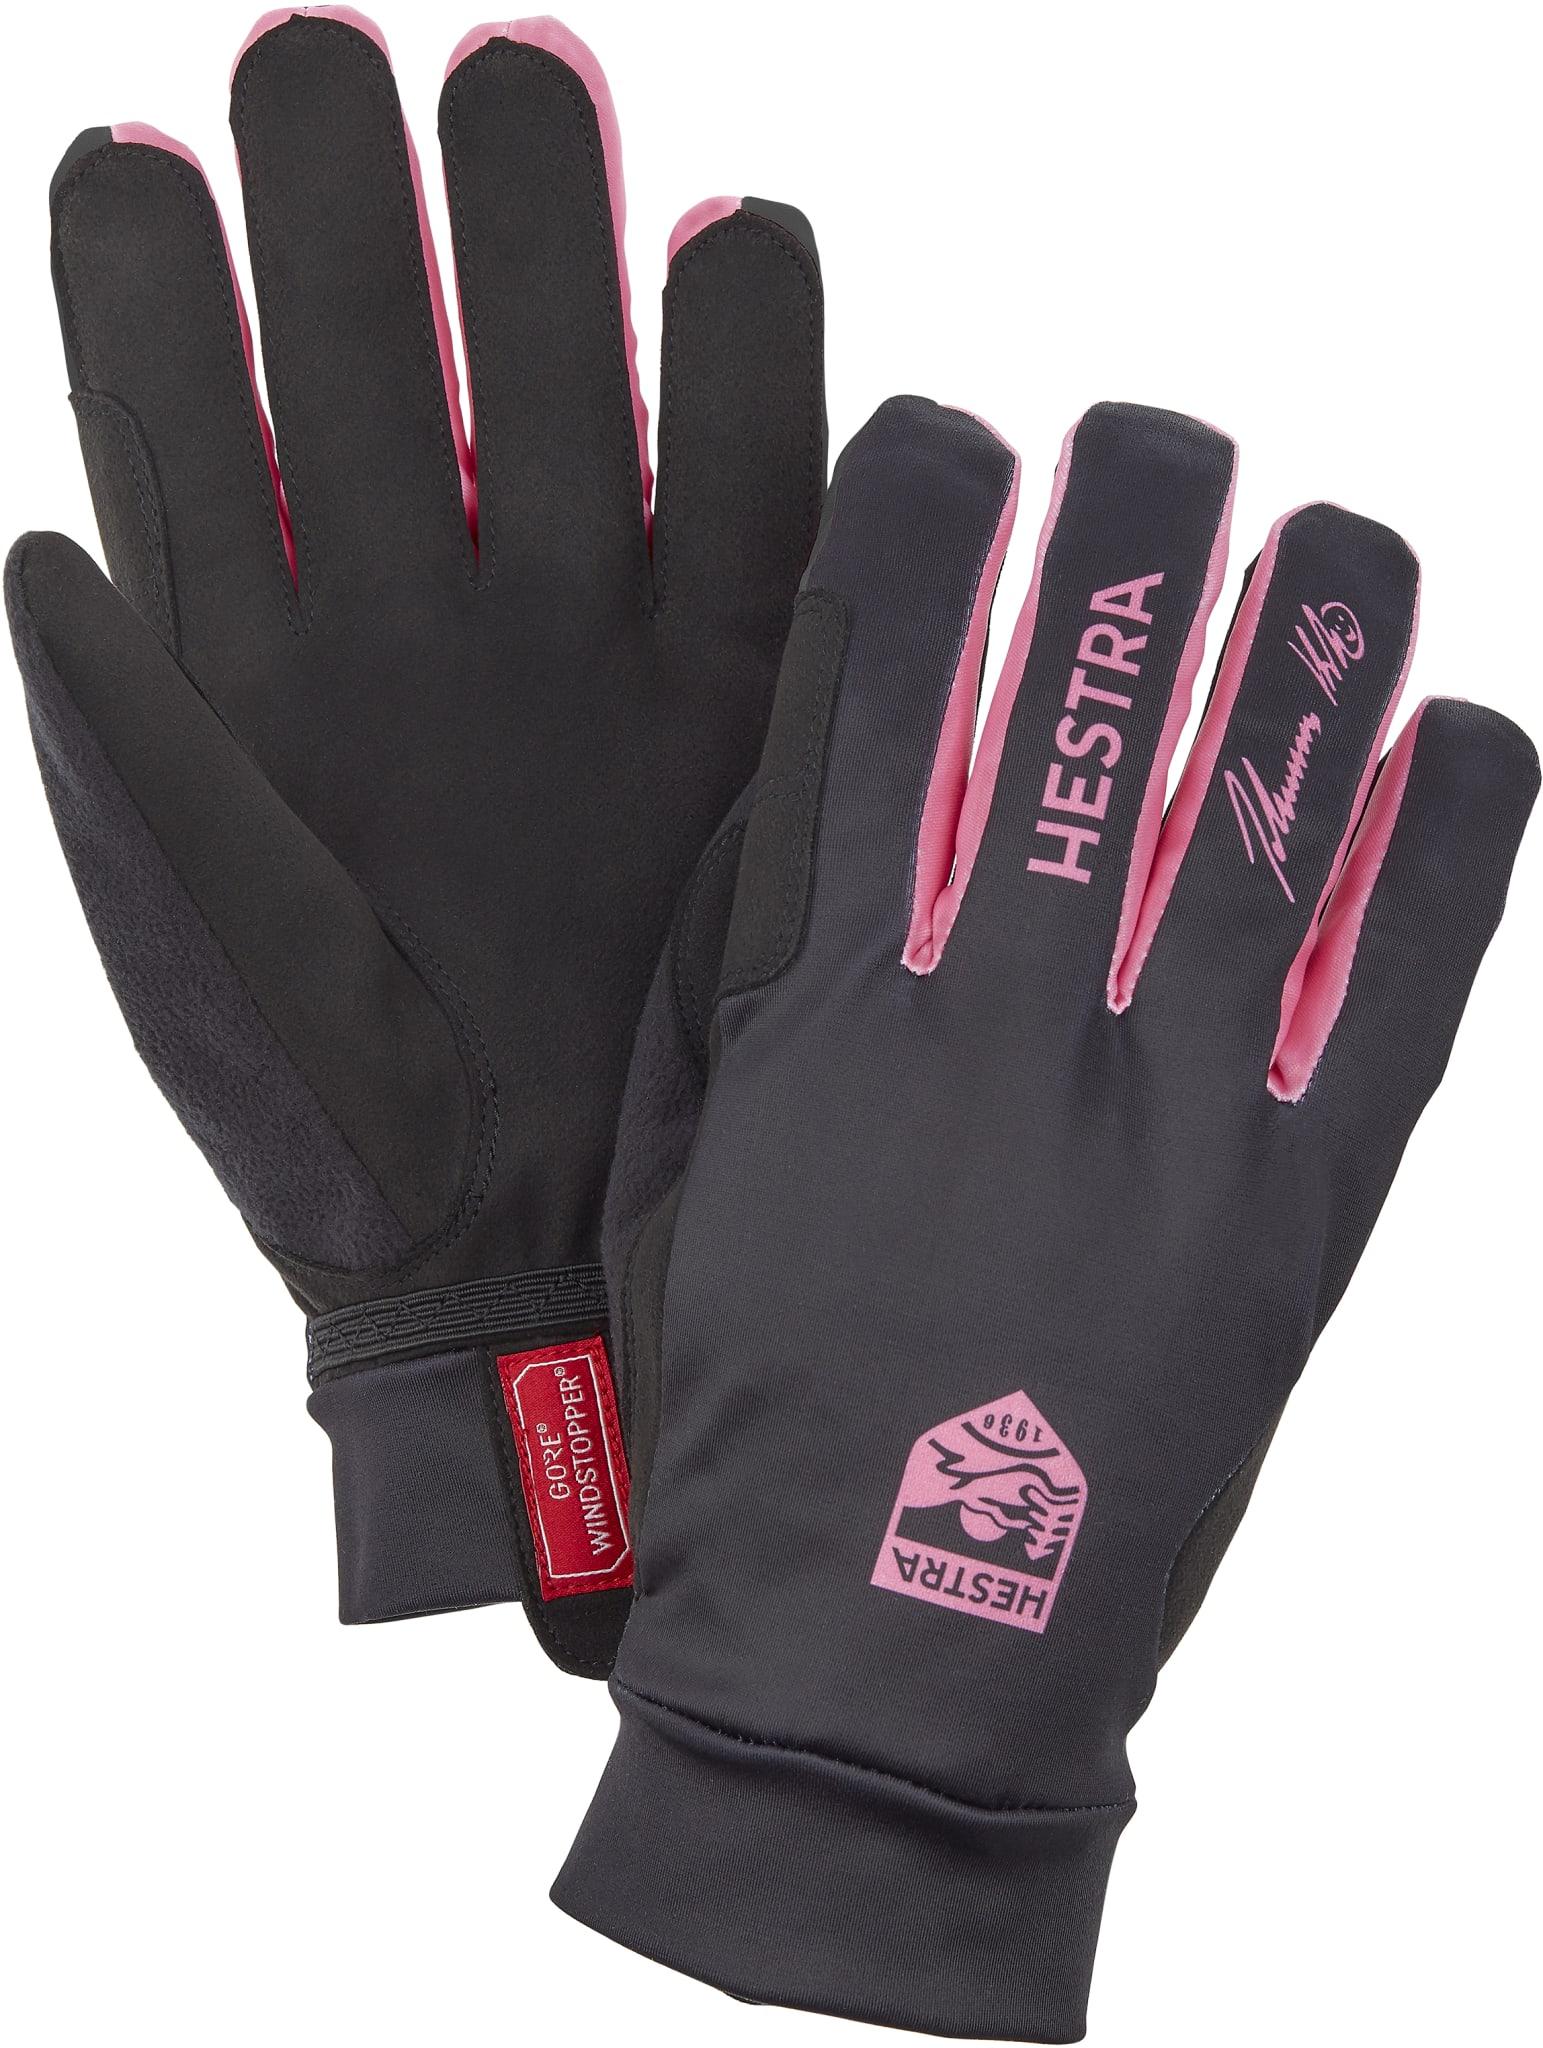 Klæbo Pro Model Gloves